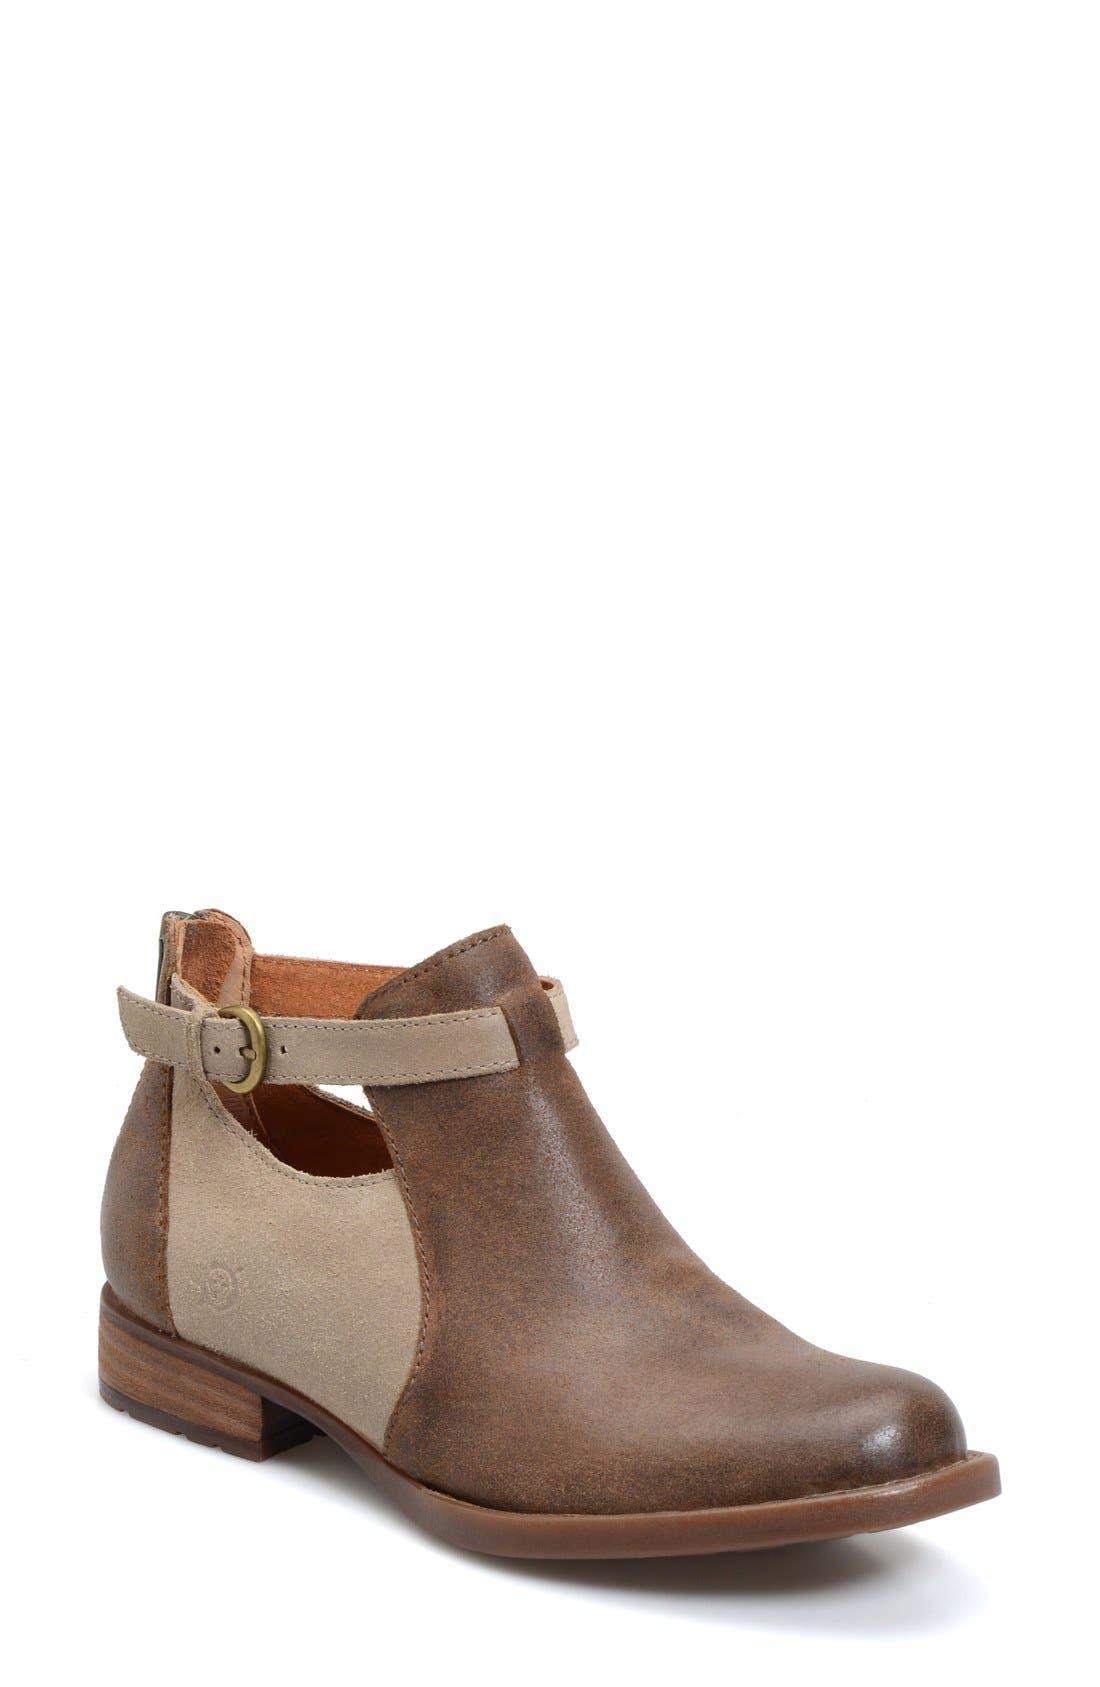 'Posh' Cutout Bootie,                         Main,                         color, Brown/ Castoro Leather